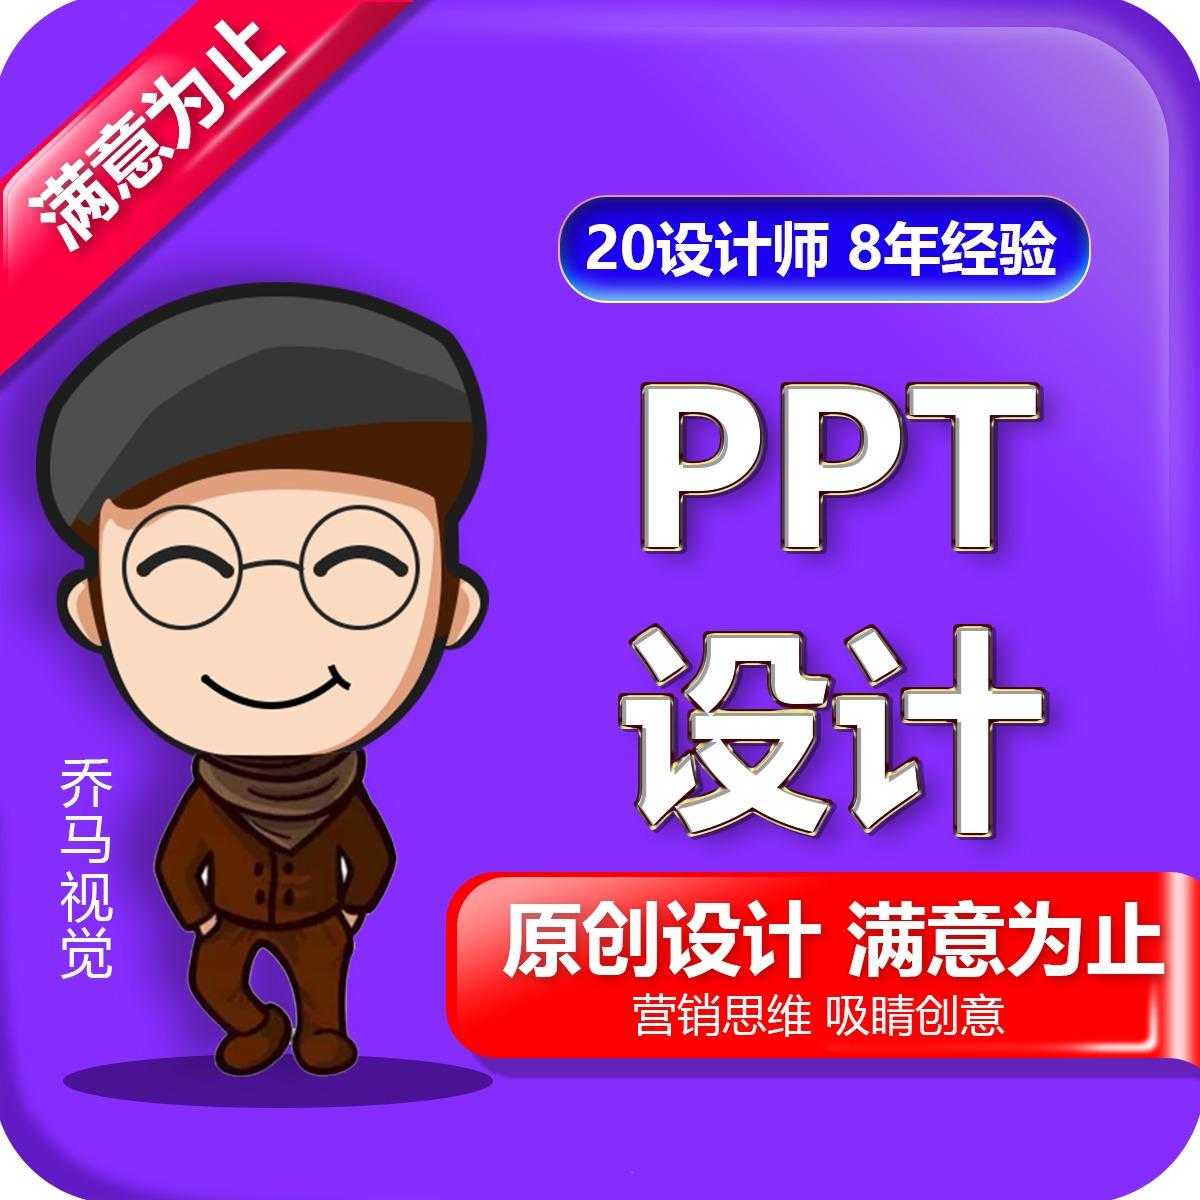 PPT设计路演PPT制作美化项目ppt演示汇报模板H5设计